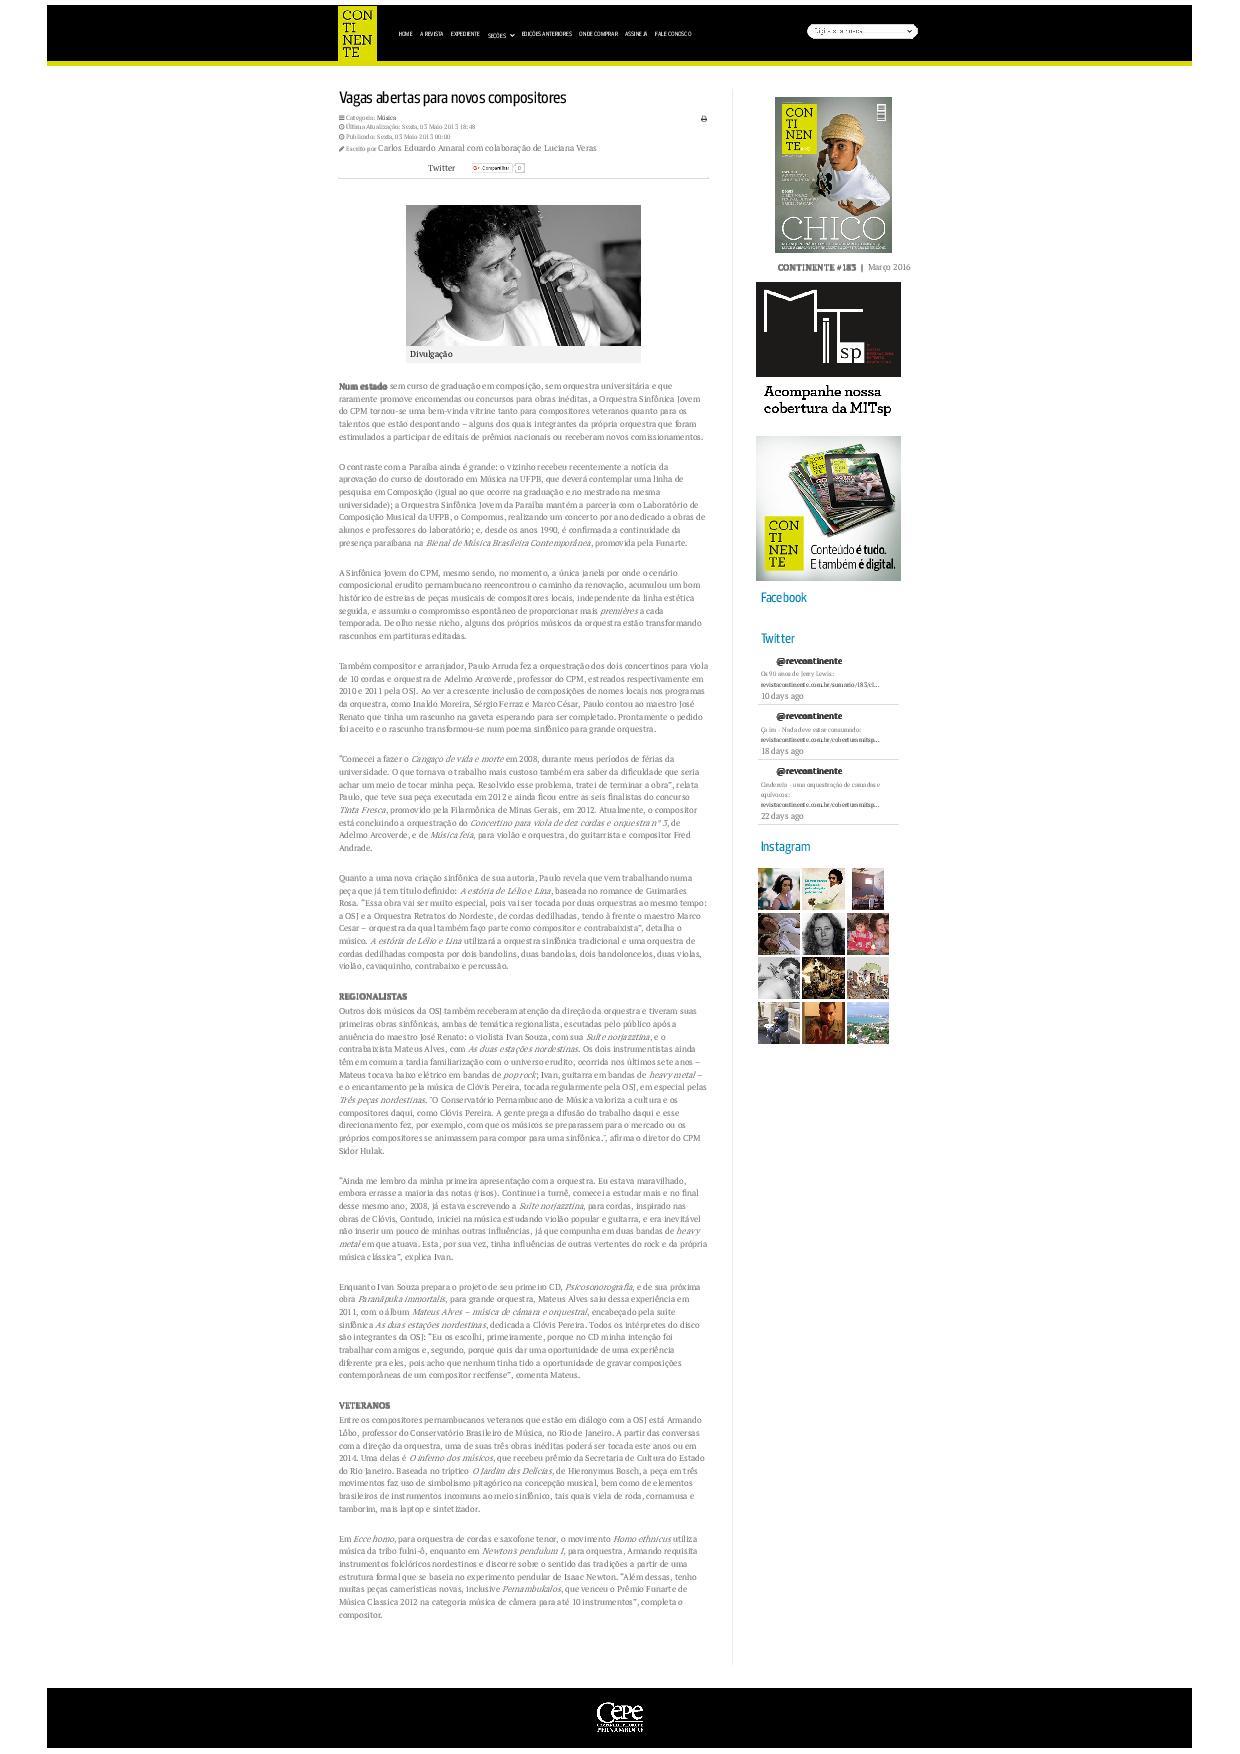 Vagas abertas para novos compositores - Revista Continente - Revista pernambucana de jornalismo cult